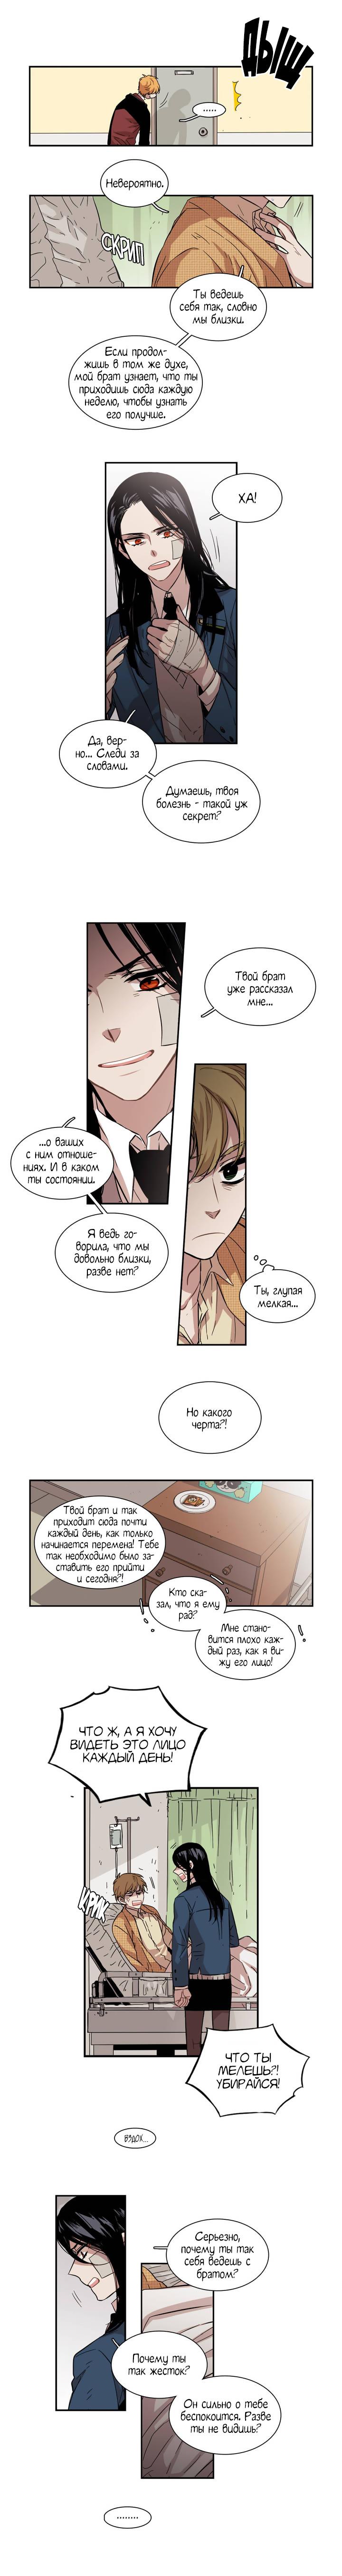 https://r1.ninemanga.com/comics/pic2/24/19800/412048/1524672969567.jpg Page 4